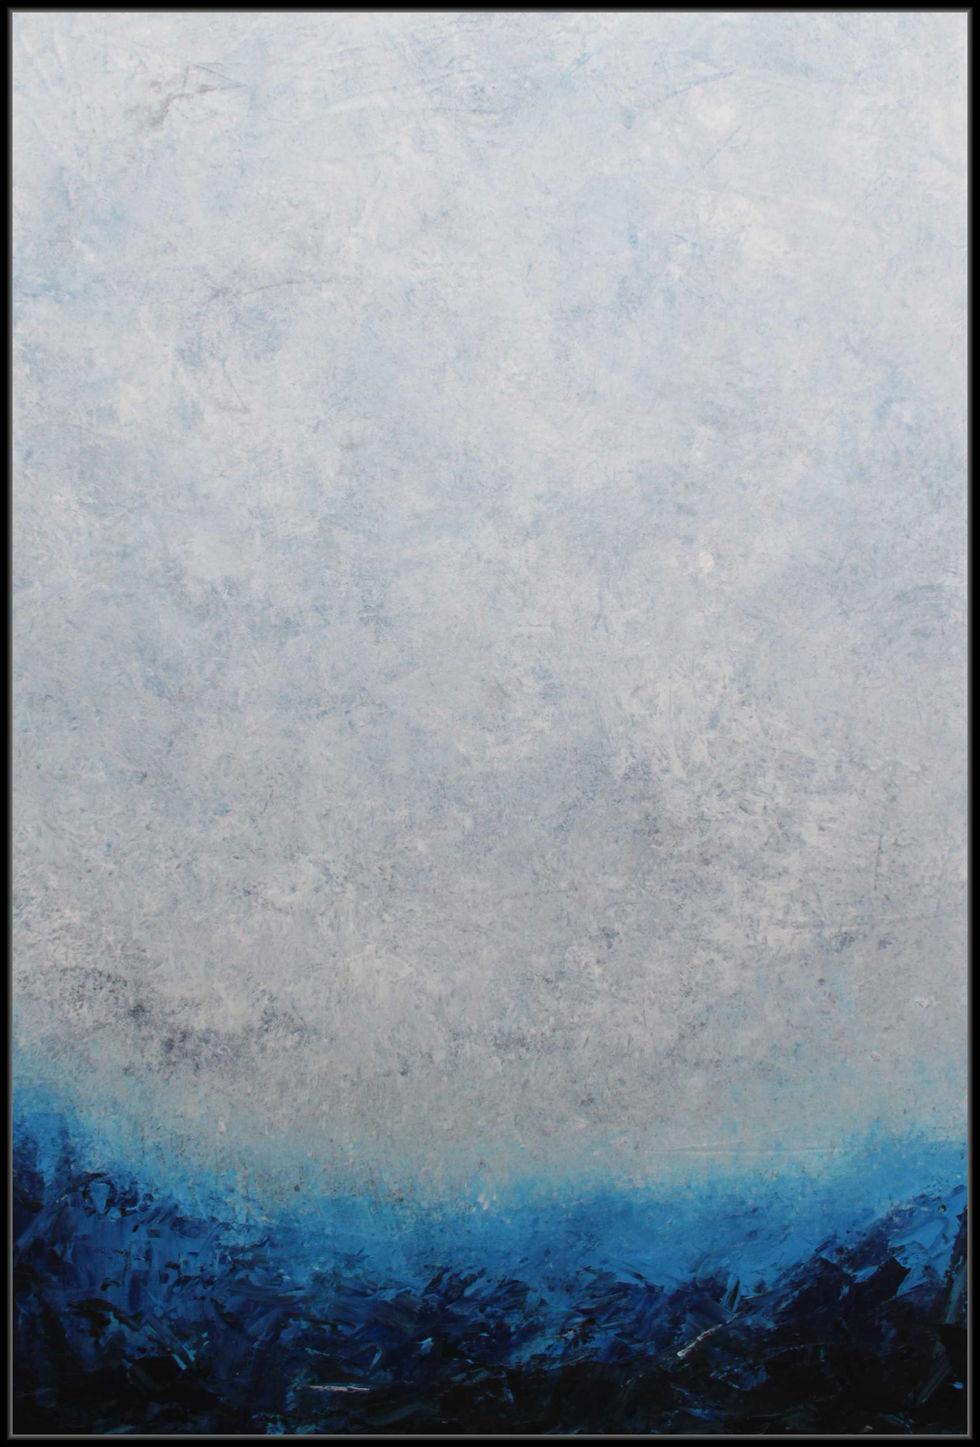 William-Mills-Abstract-Art-17.jpg